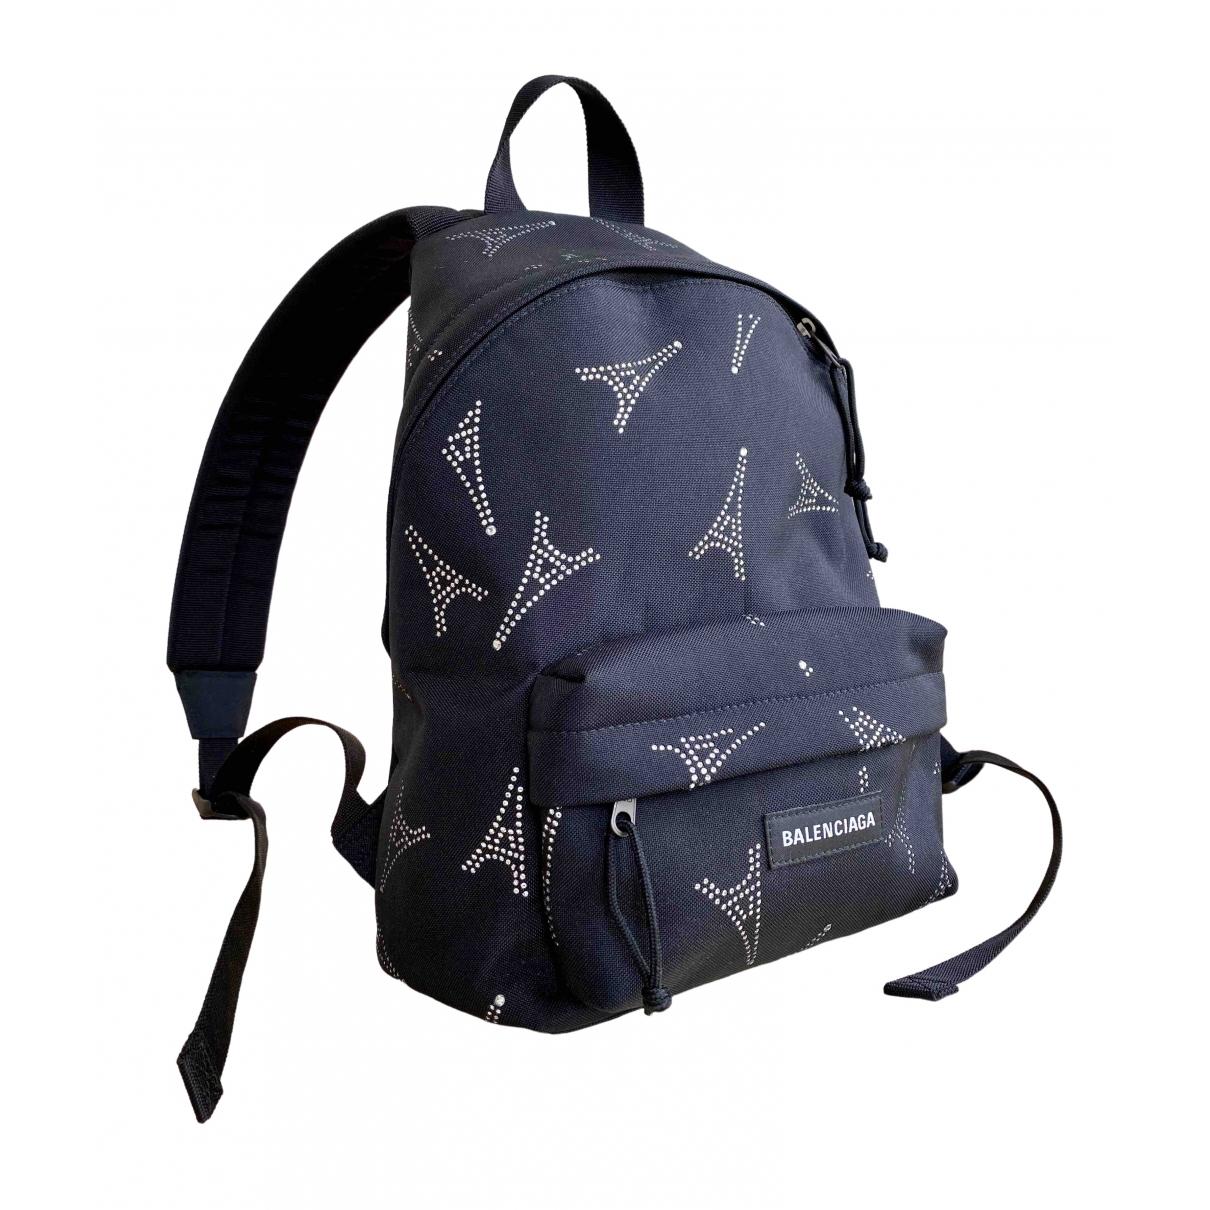 Balenciaga \N Black Cloth backpack for Women \N